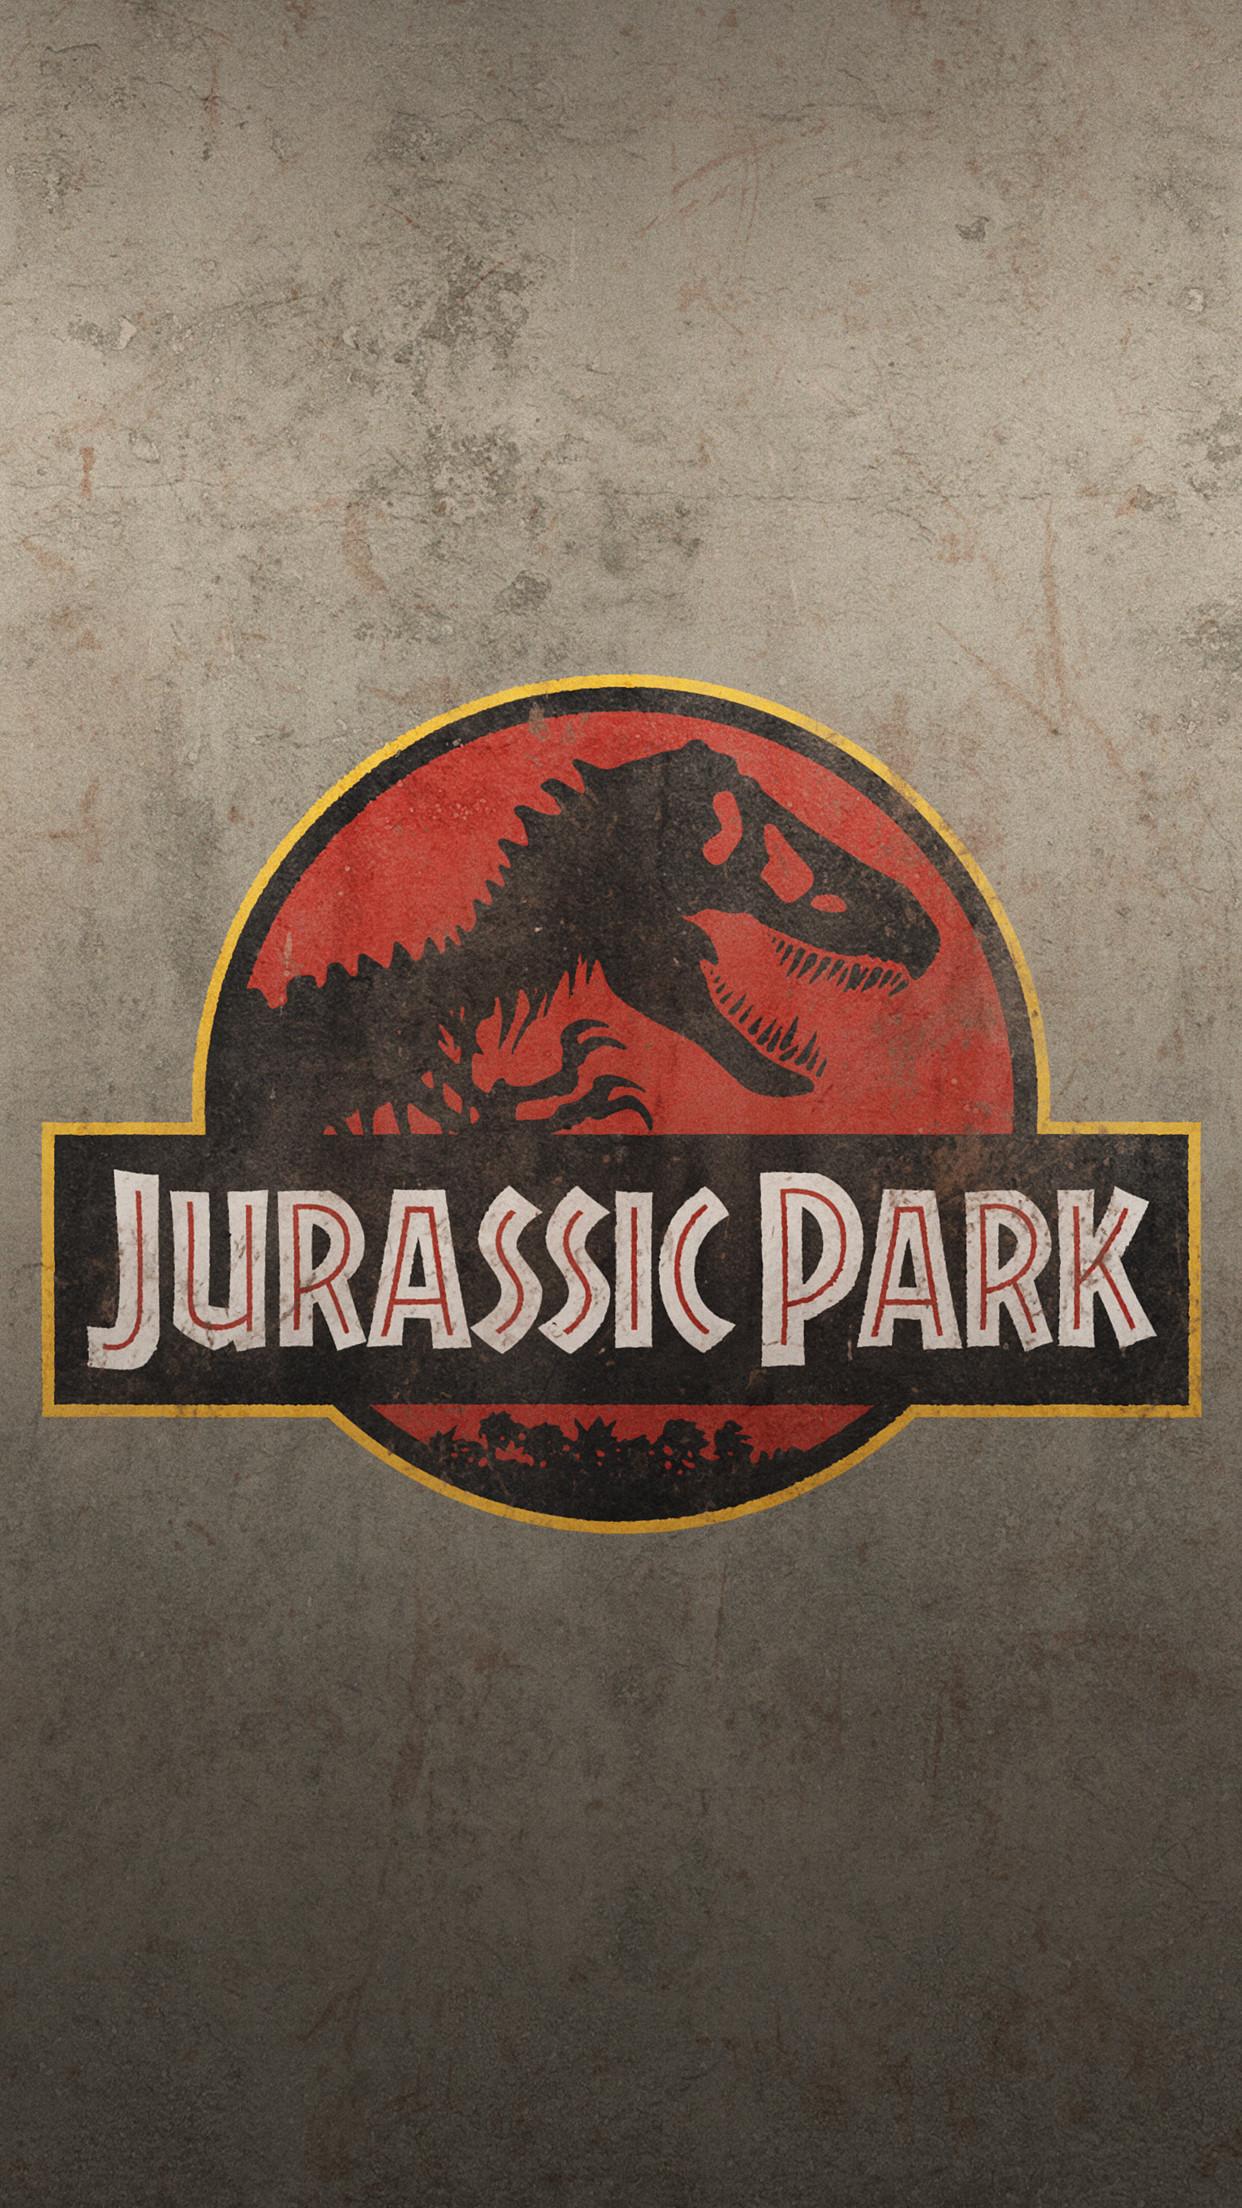 Jurassic Park Wallpaper iPhone (70+ images)